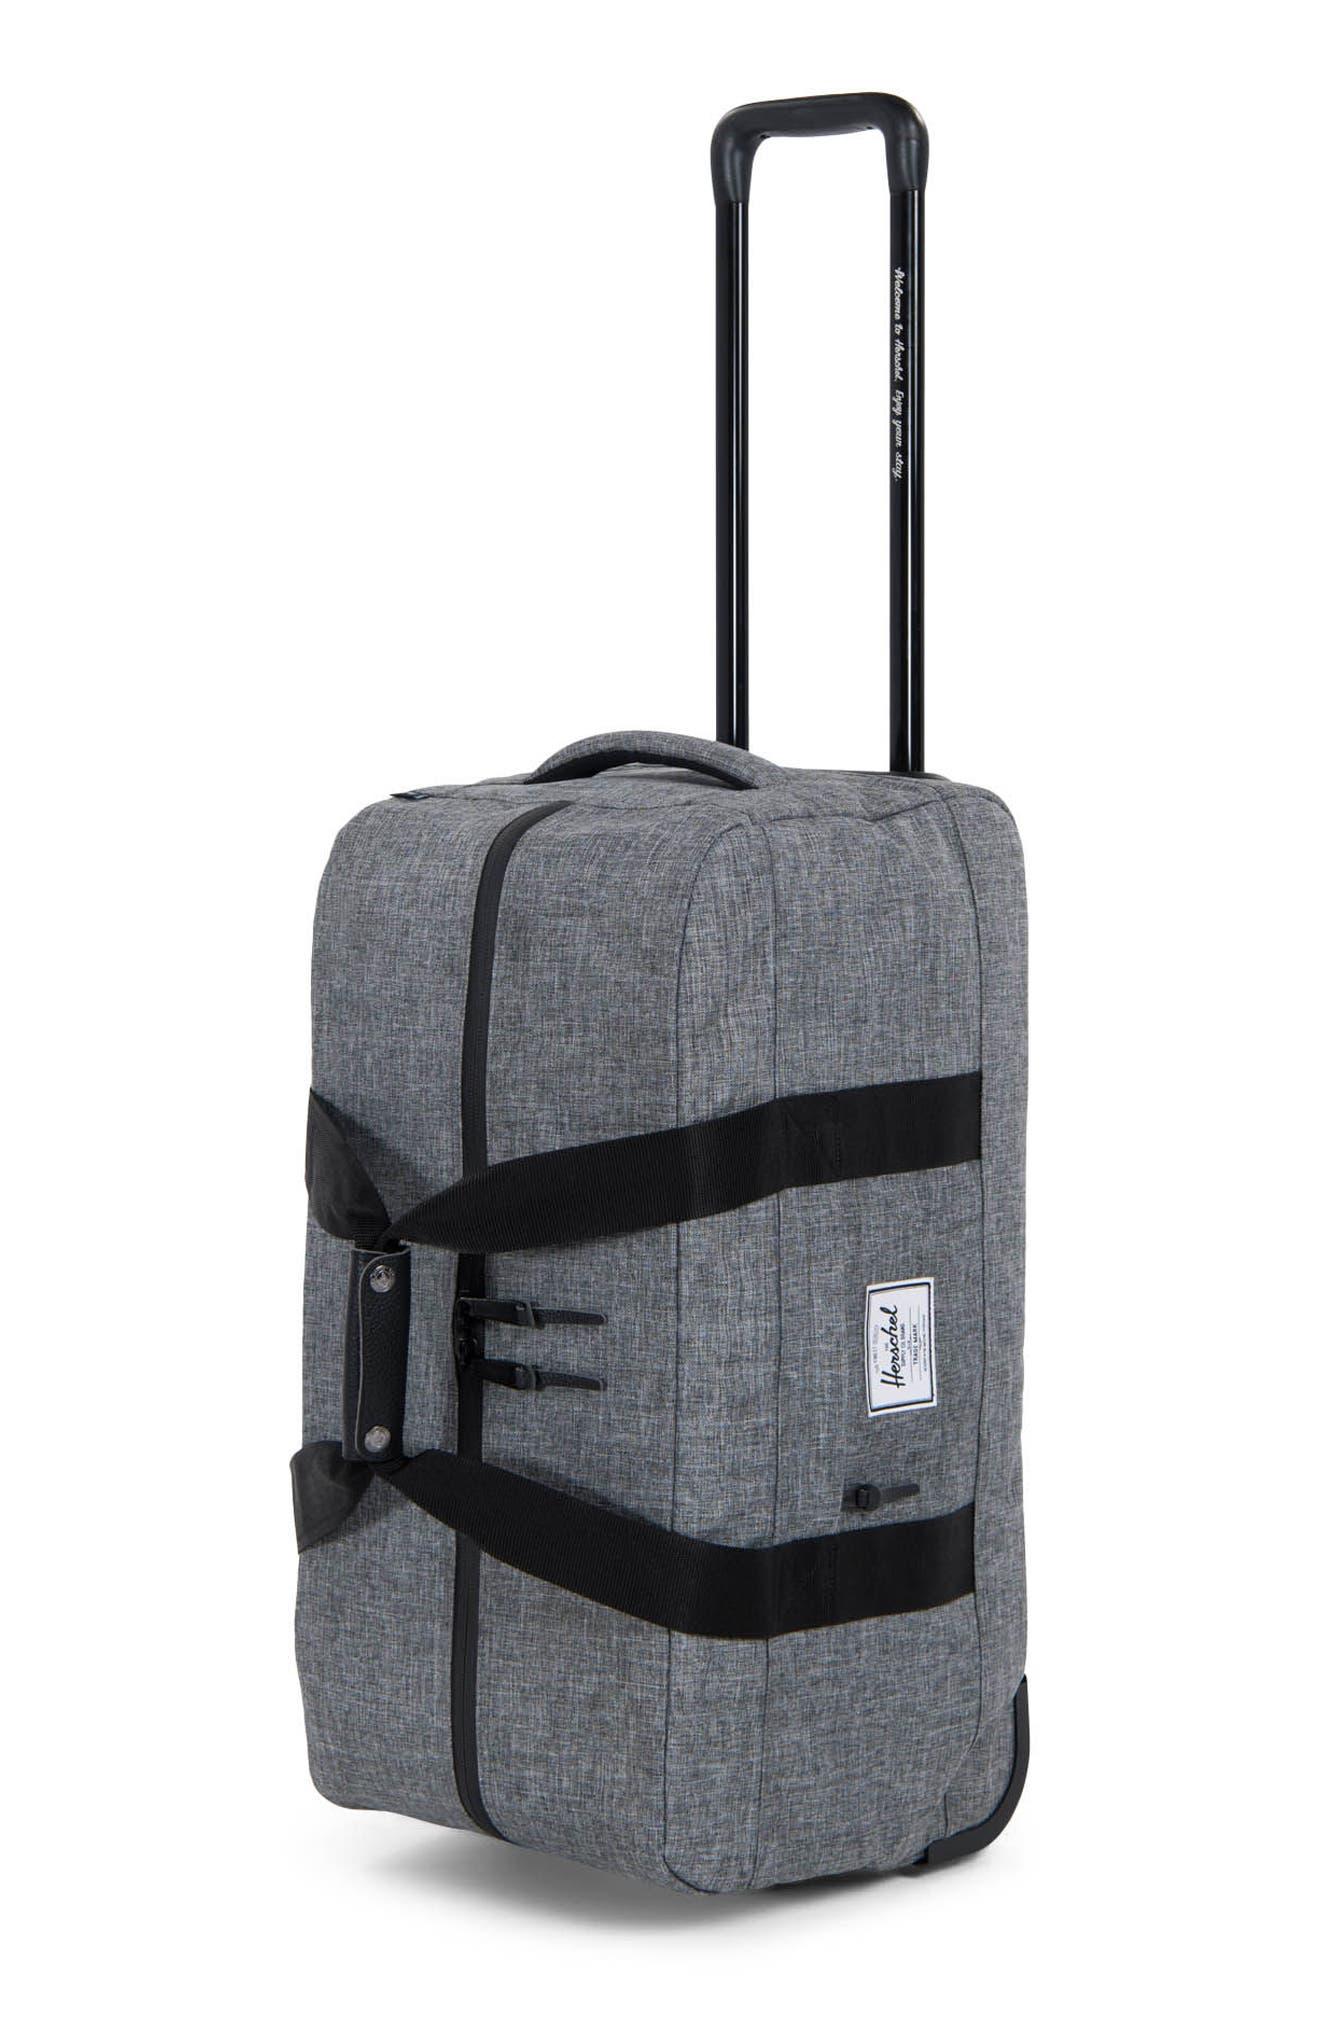 Wheelie Outfitter 24-Inch Duffel Bag,                             Alternate thumbnail 3, color,                             Raven Crosshatch